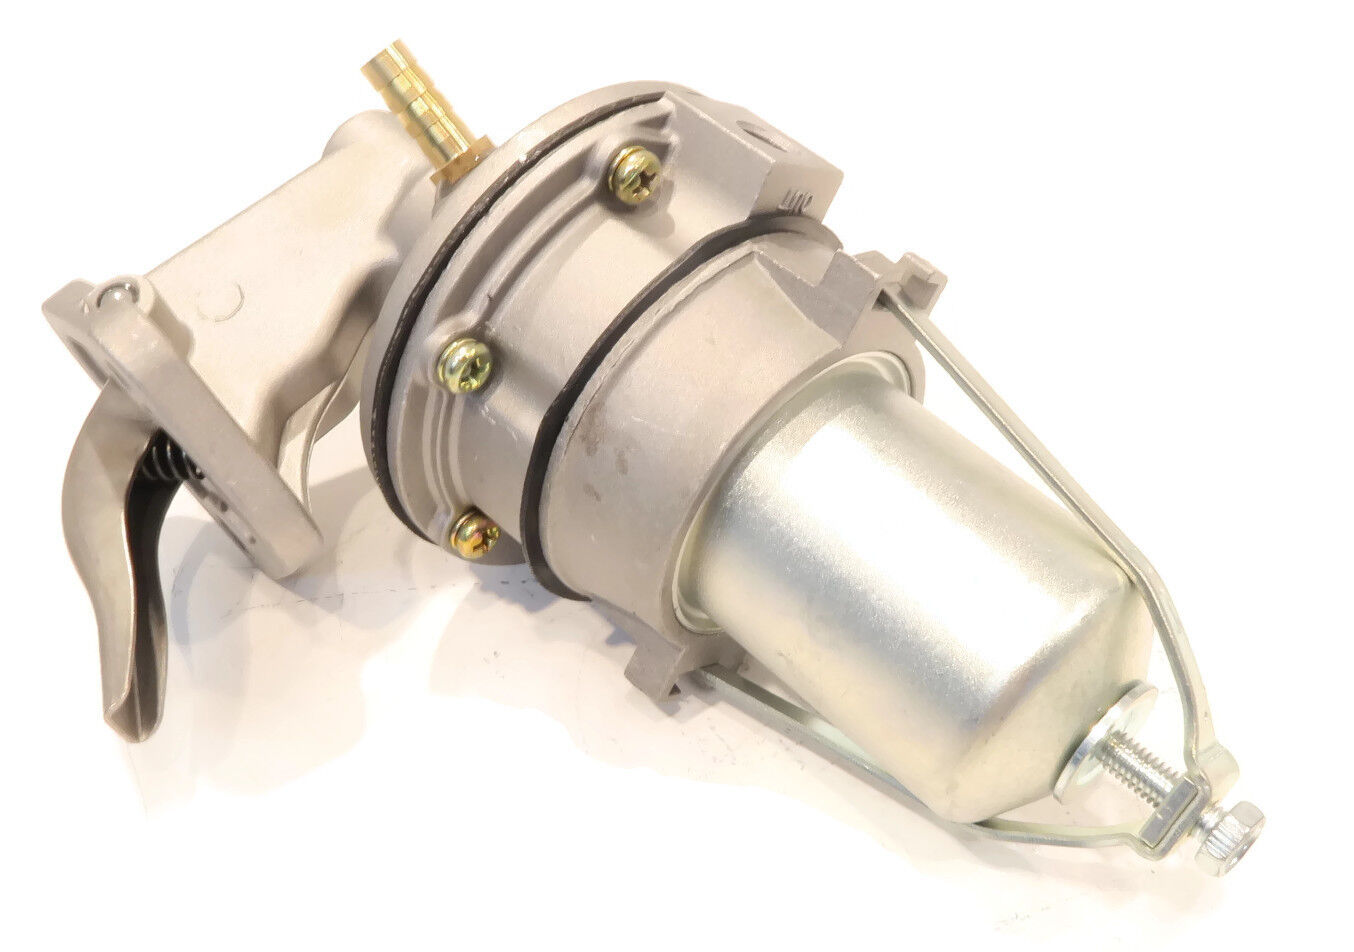 FUEL PUMP W// GASKETS for Sierra 18-7282 18-35437 OMC 509407 4-Cylinder Engines